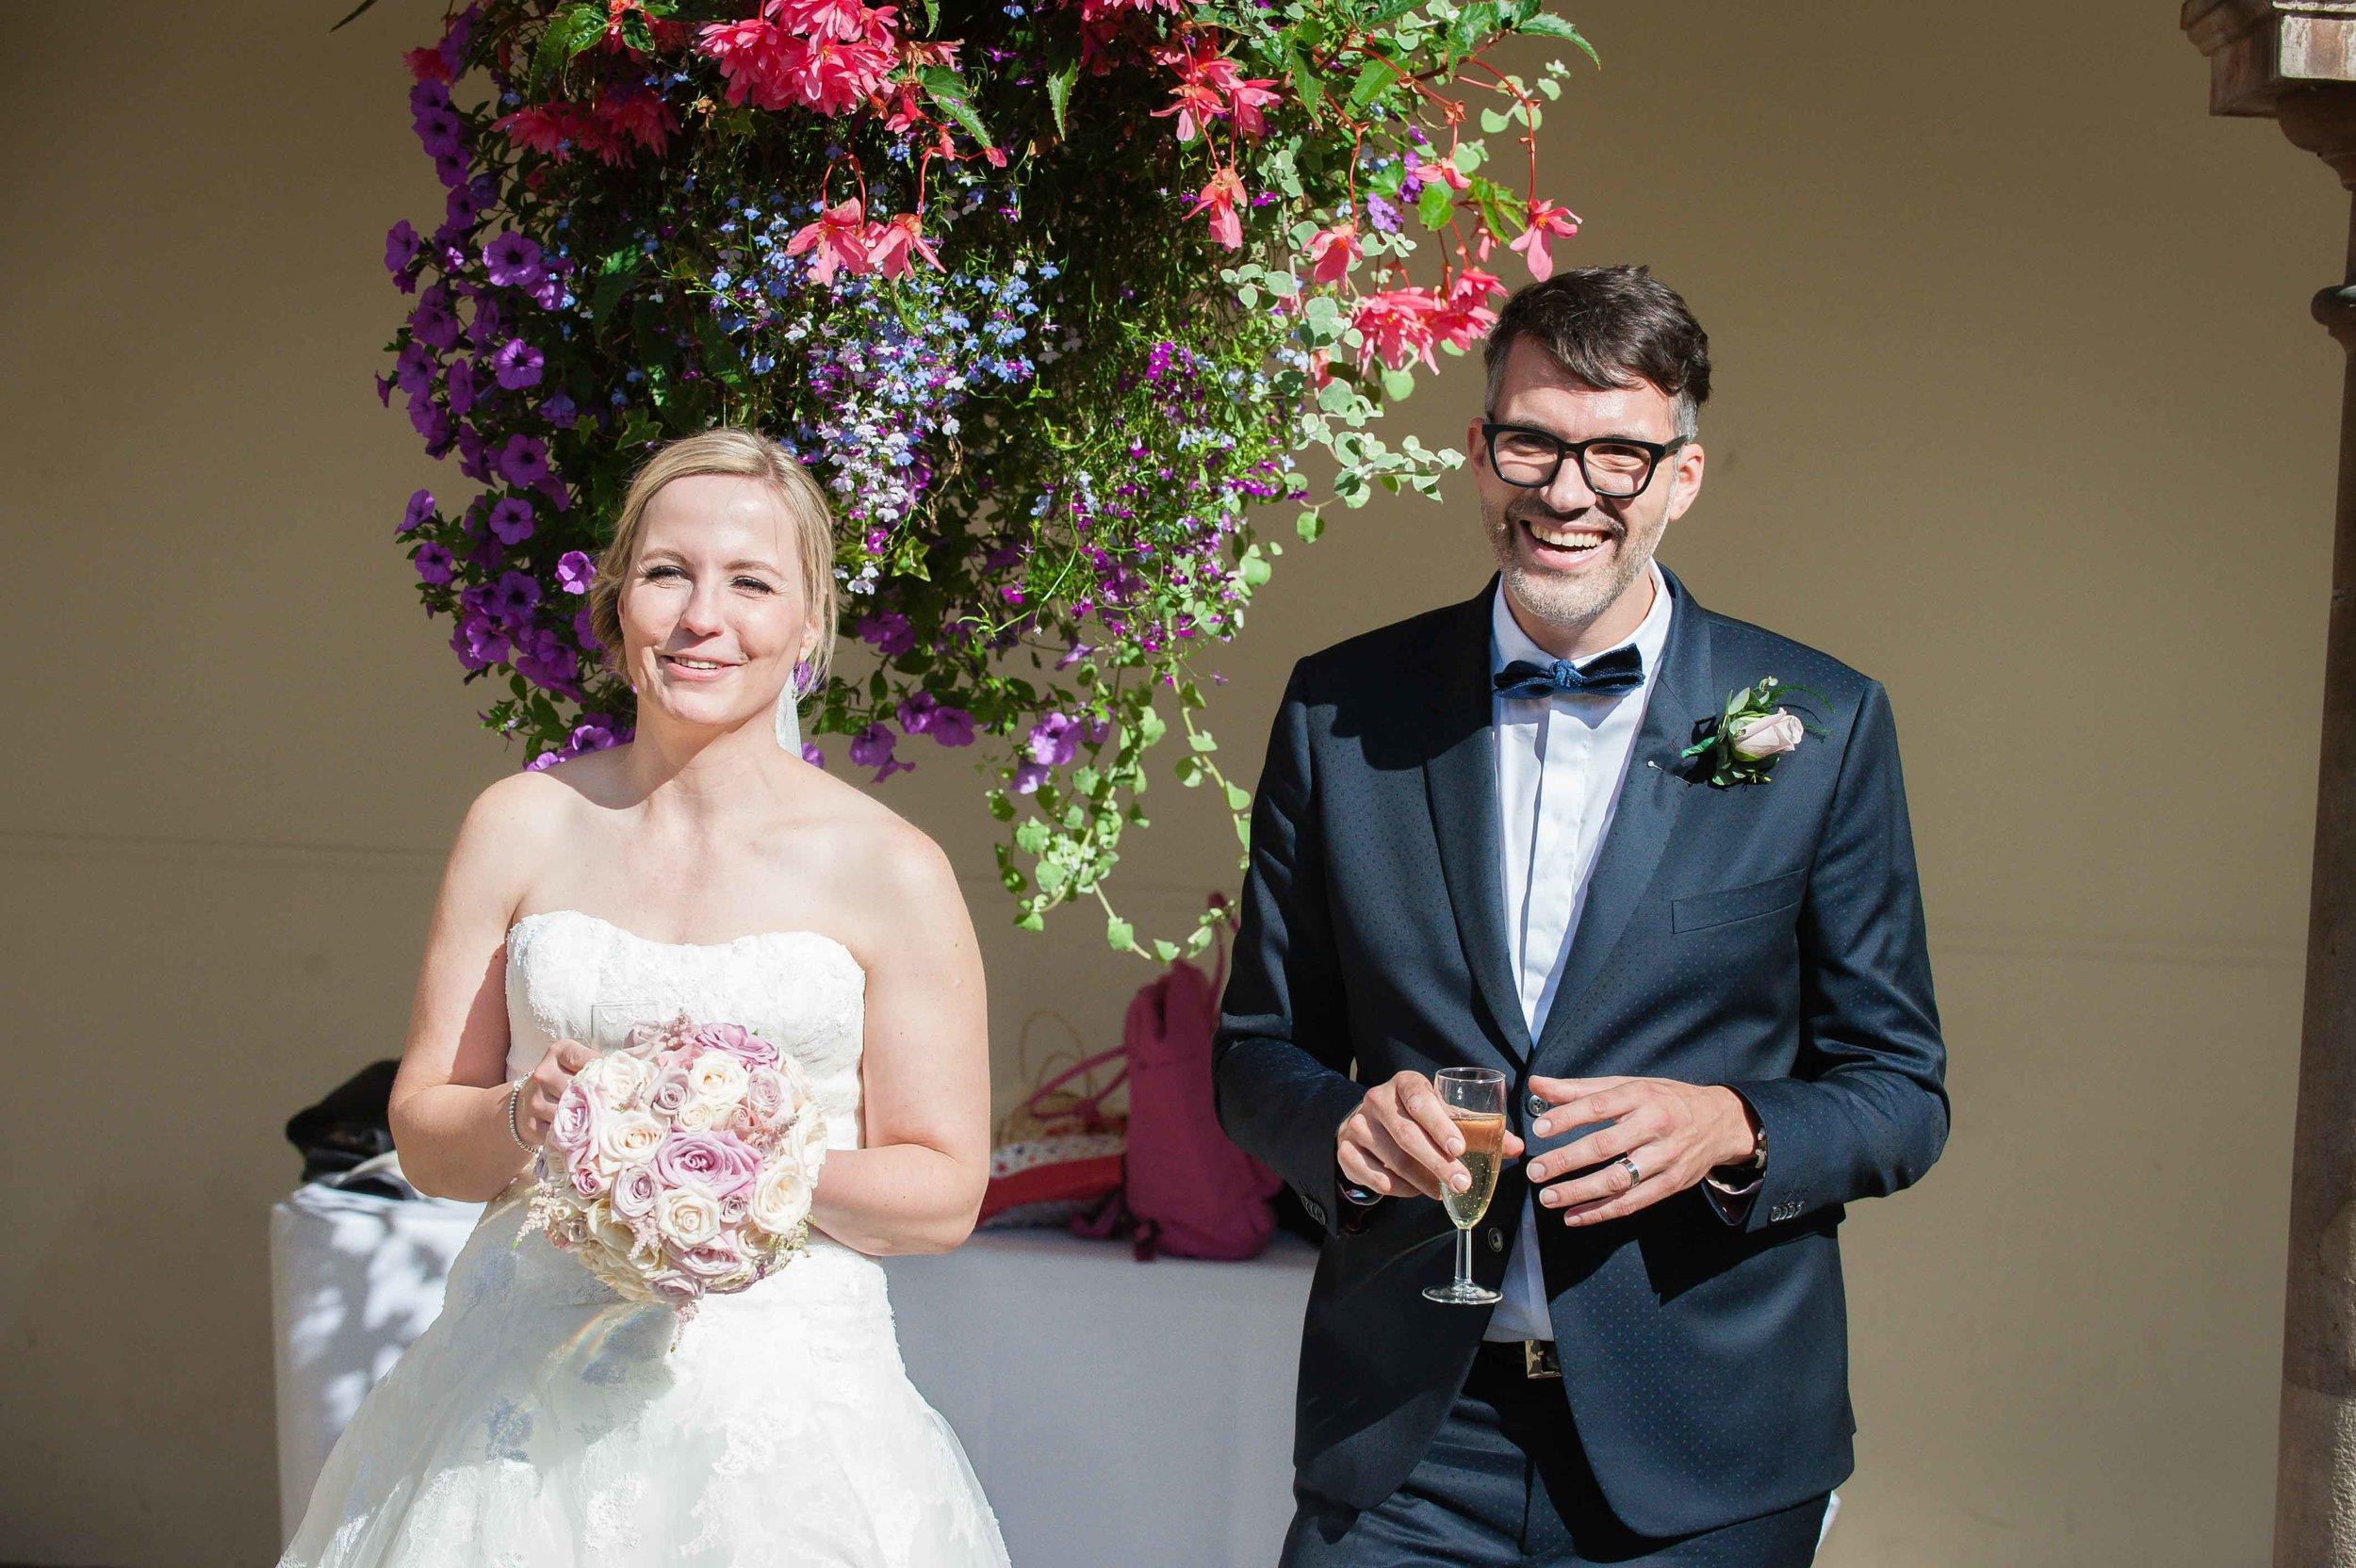 Adrian_Nicole_Charnwood_Weddings_Queens_College_Cambridge-1055.jpg